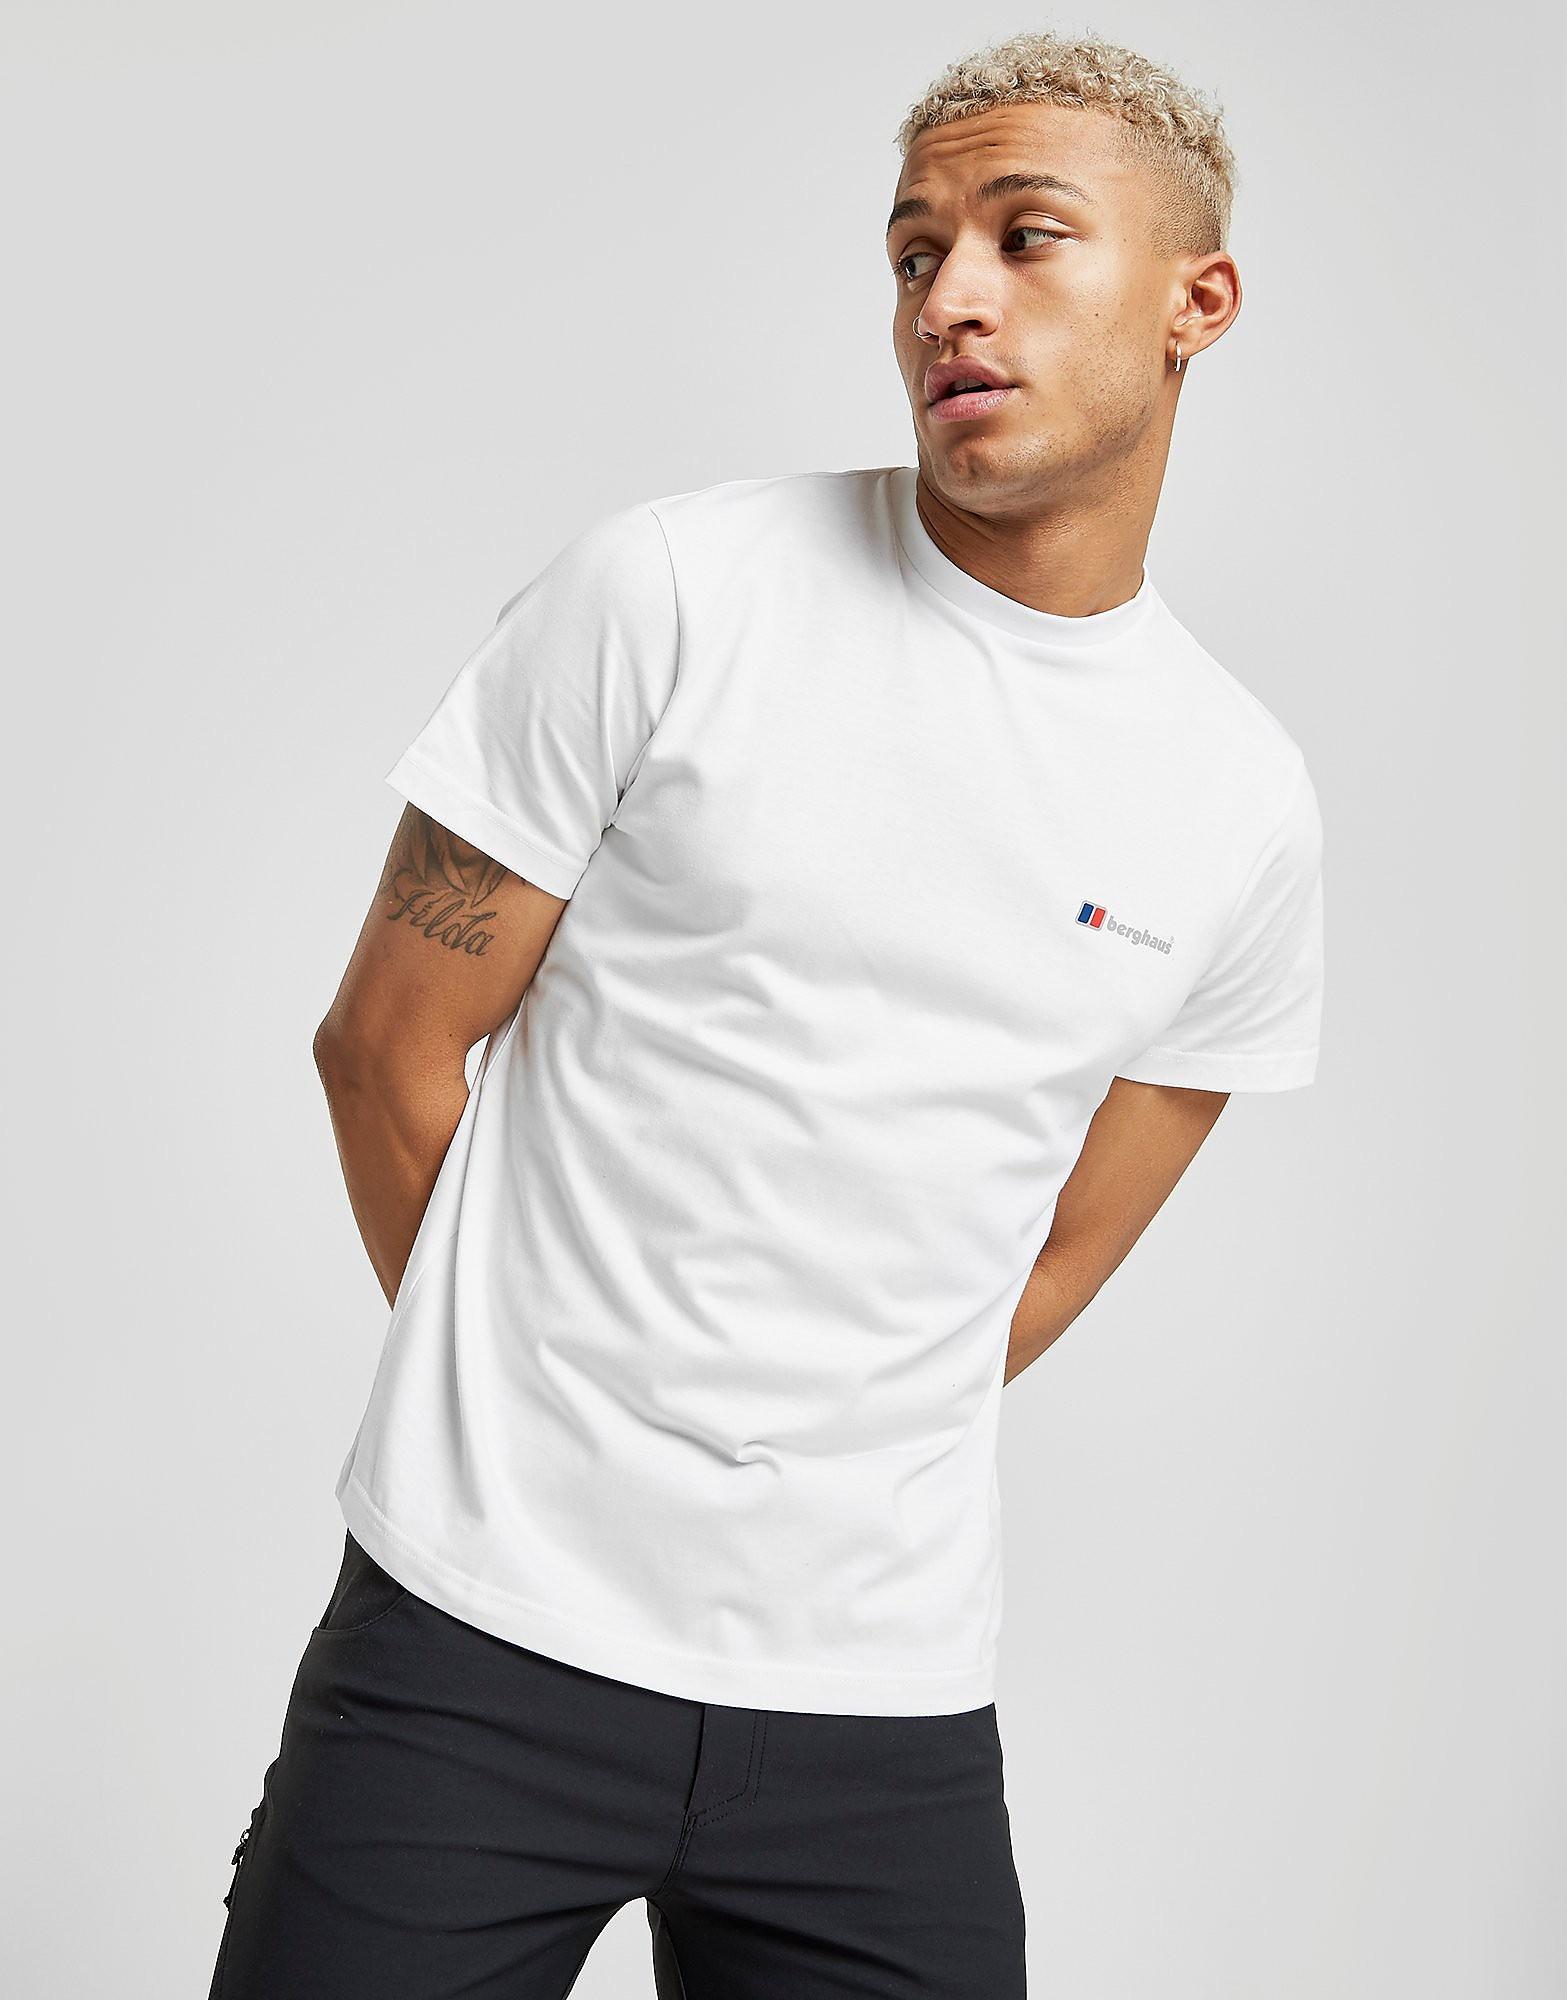 Berghaus Small Front Logo T-Shirt - Only at JD - Blanc, Blanc